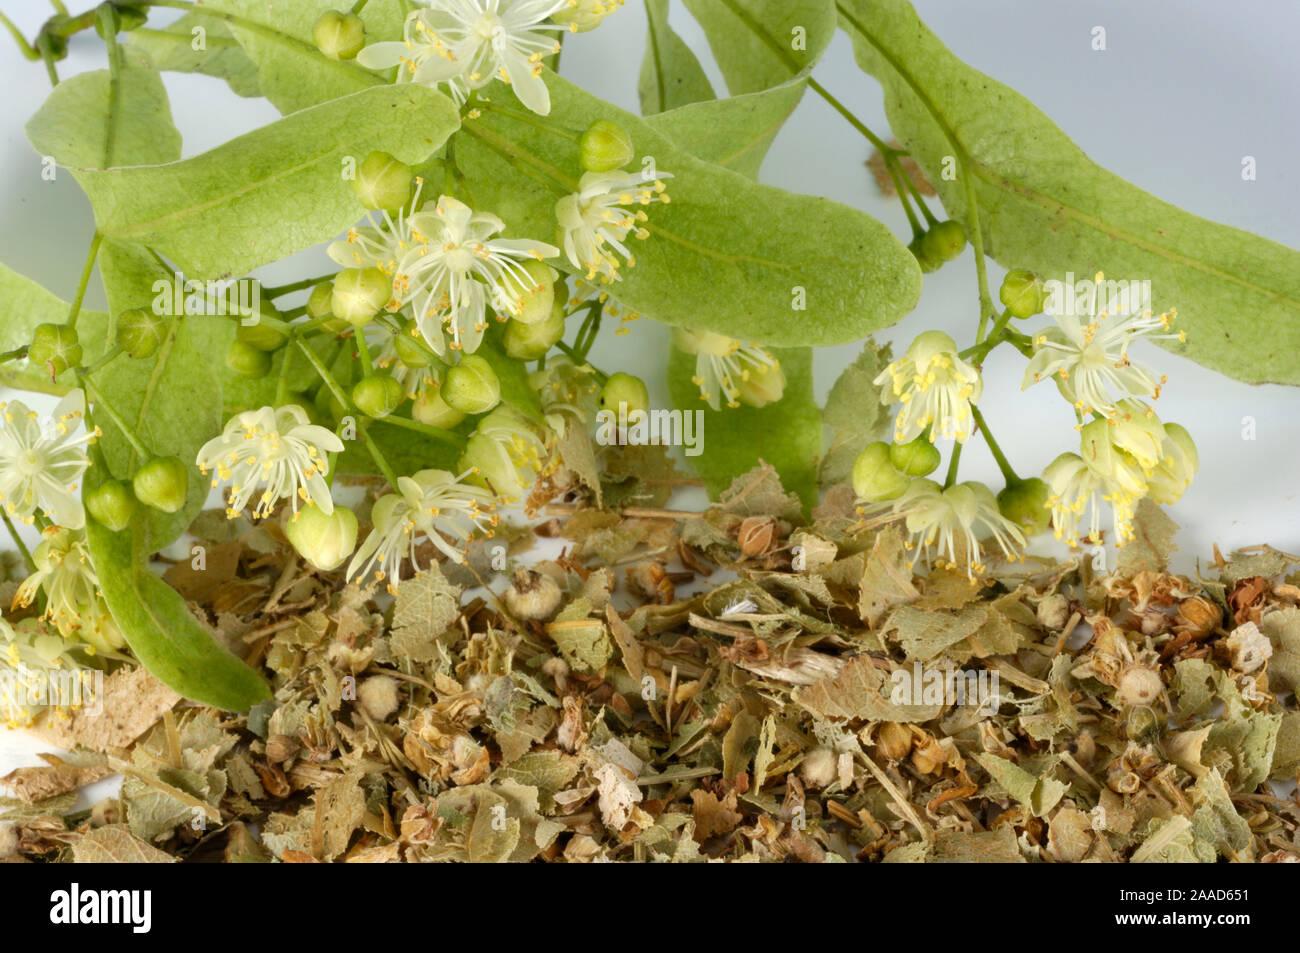 Lime, dried blooms / (Tilia tomentosa) | Sommerlinde, getrocknete Blueten / (Tilia tomentosa) / Stock Photo